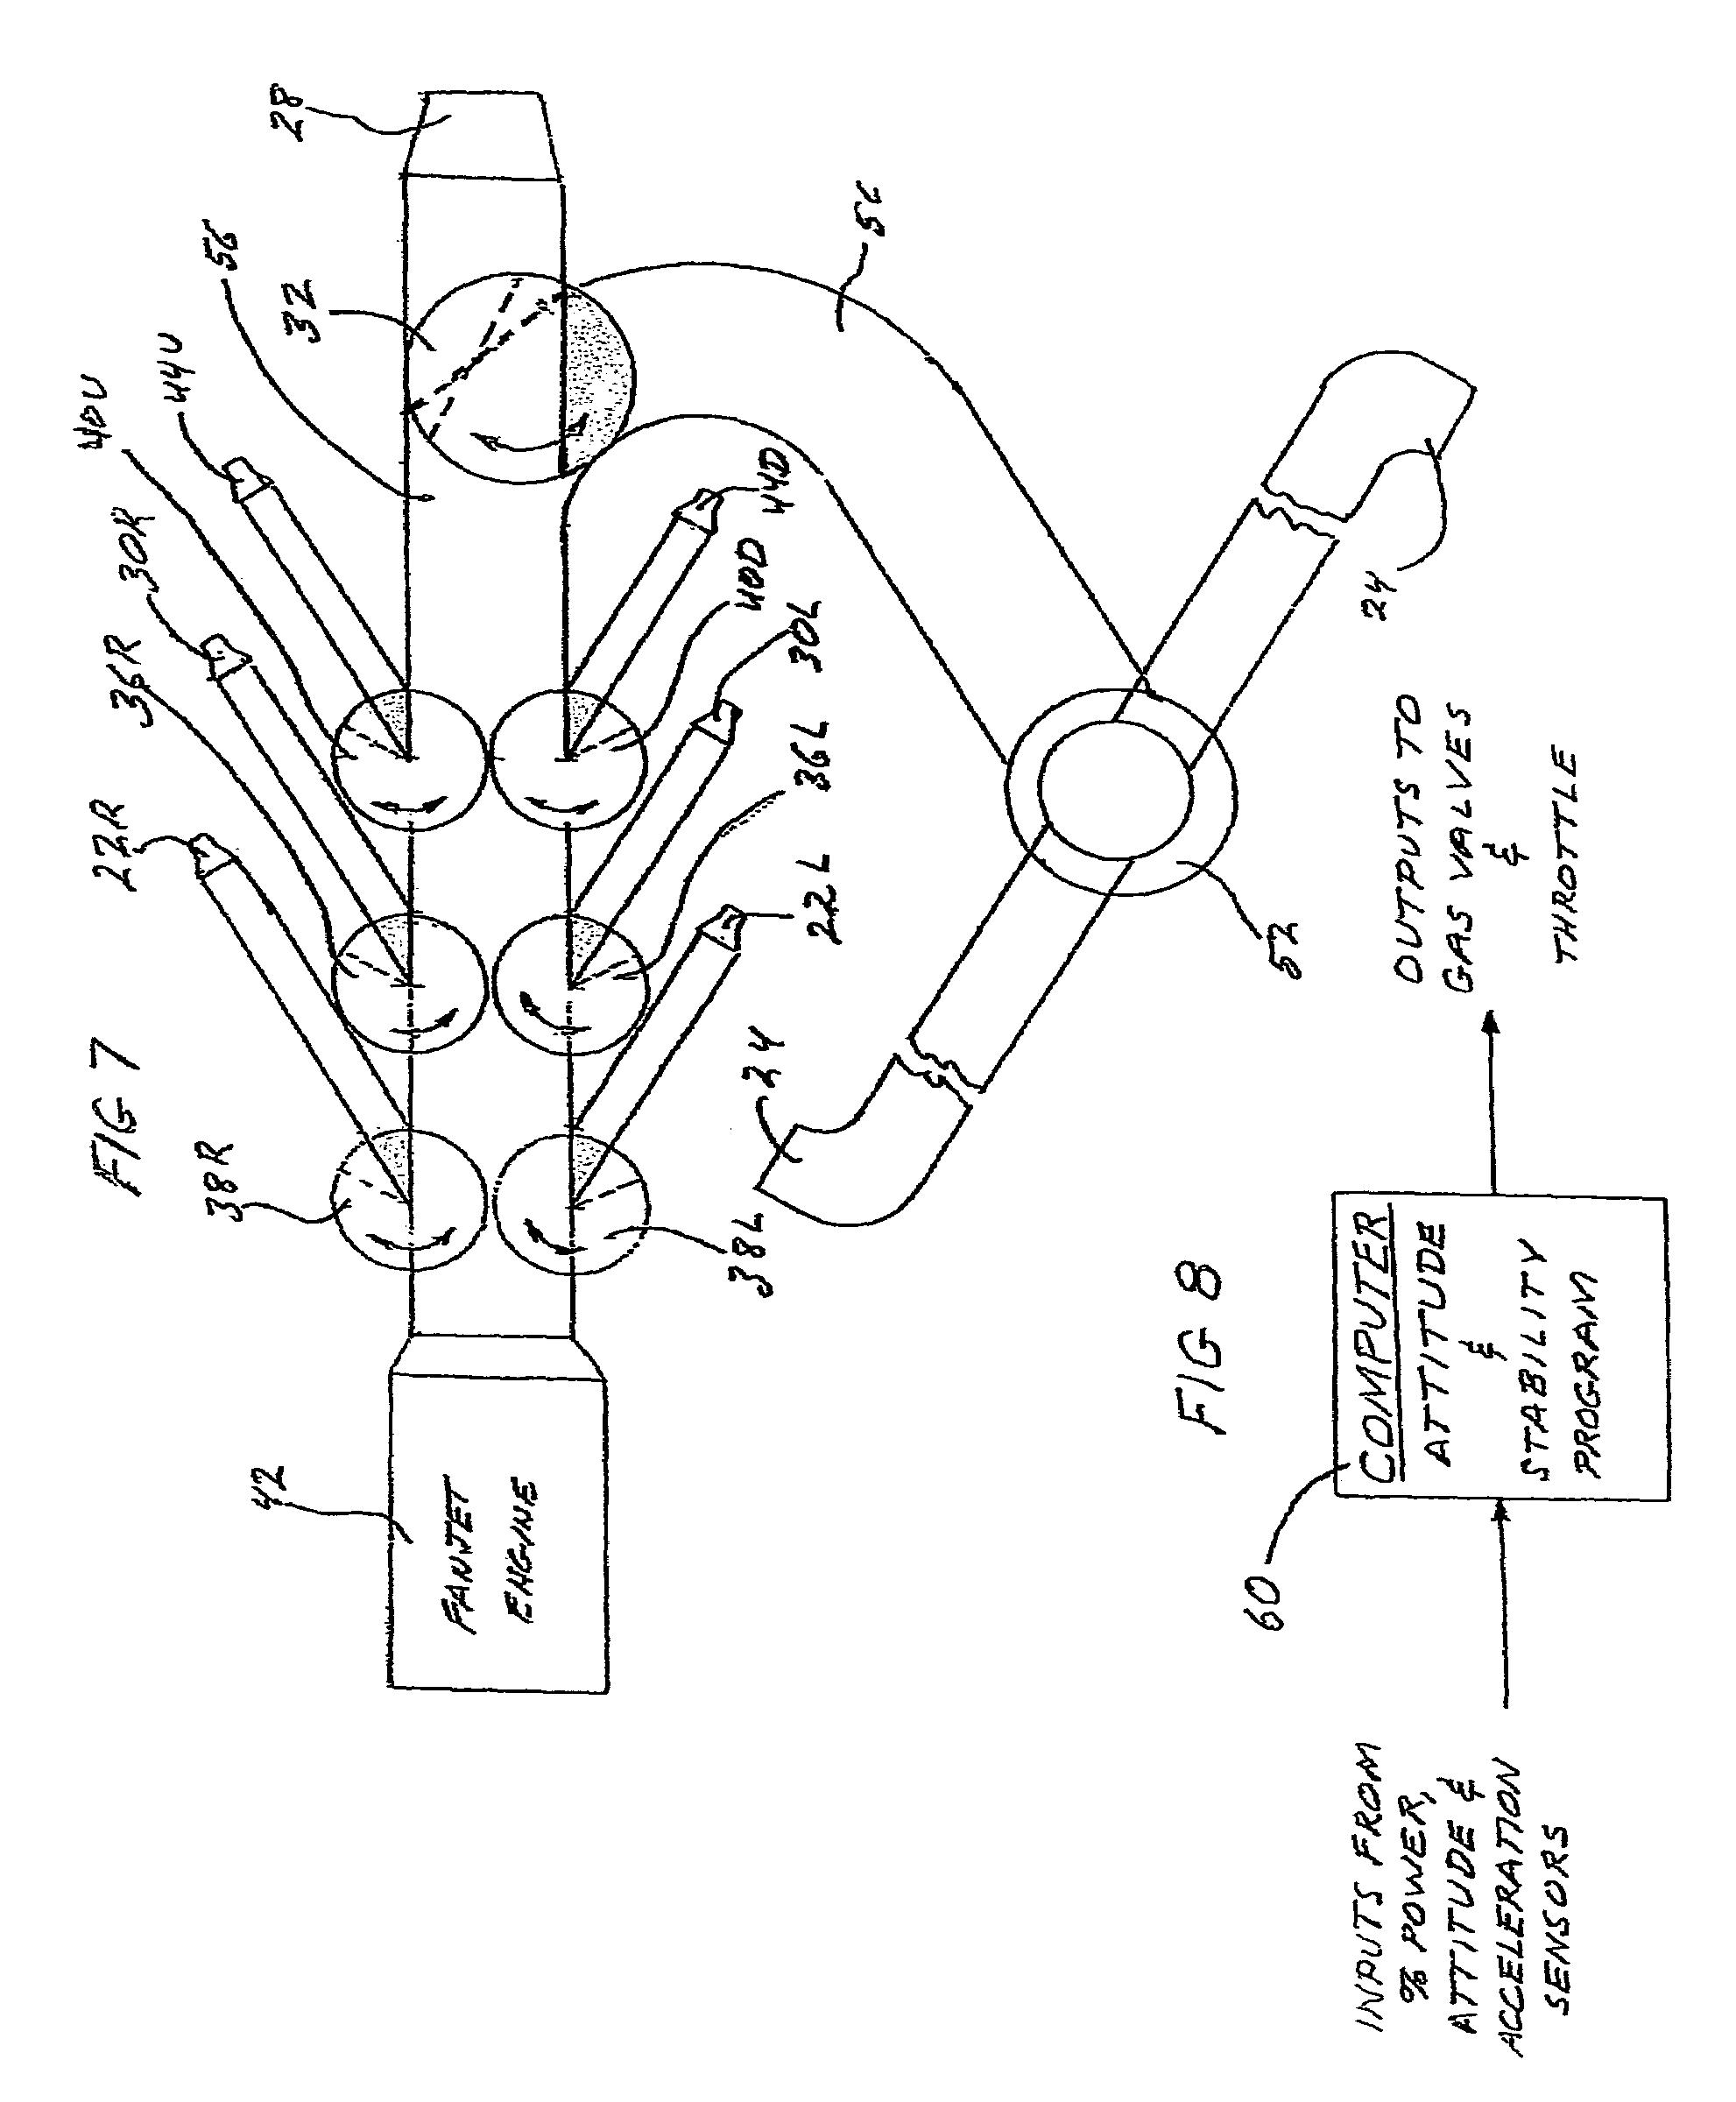 Ac wiring diagram symbols electrical wiring diagram moreover land rover freelander 2 moreover my robot can